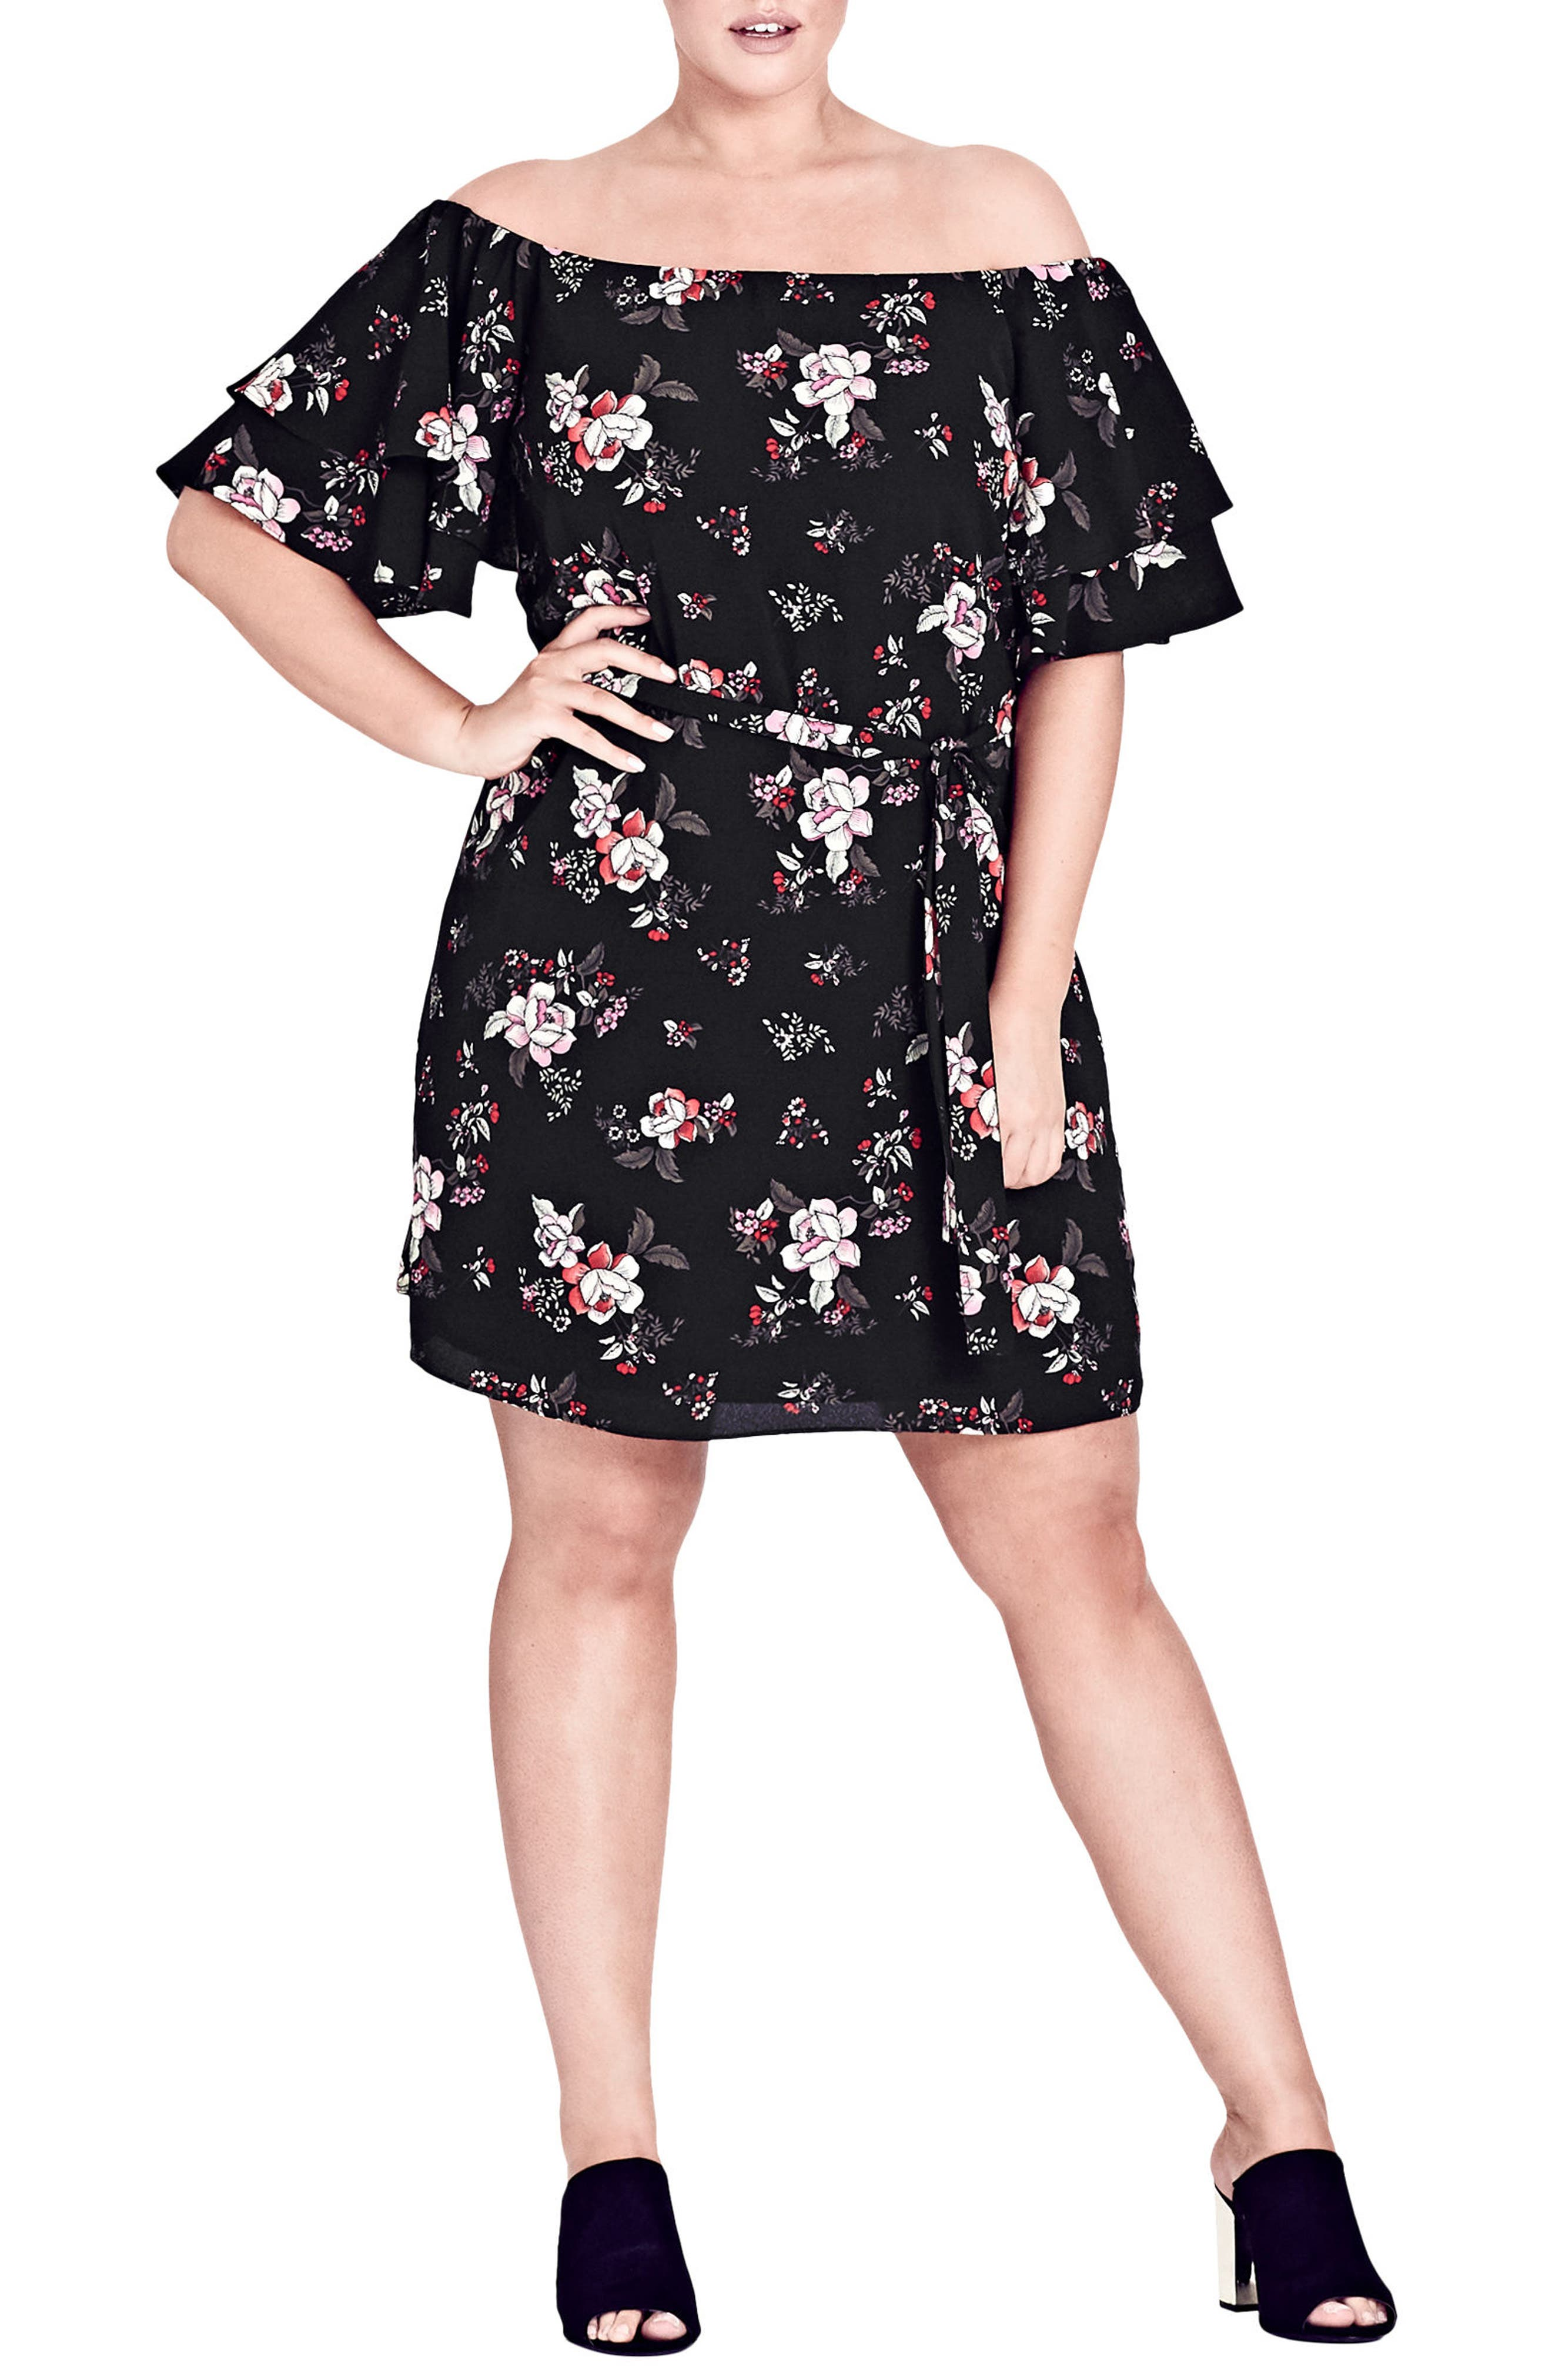 Plus Size City Chic Floral Dreaming Off The Shoulder Dress, Black